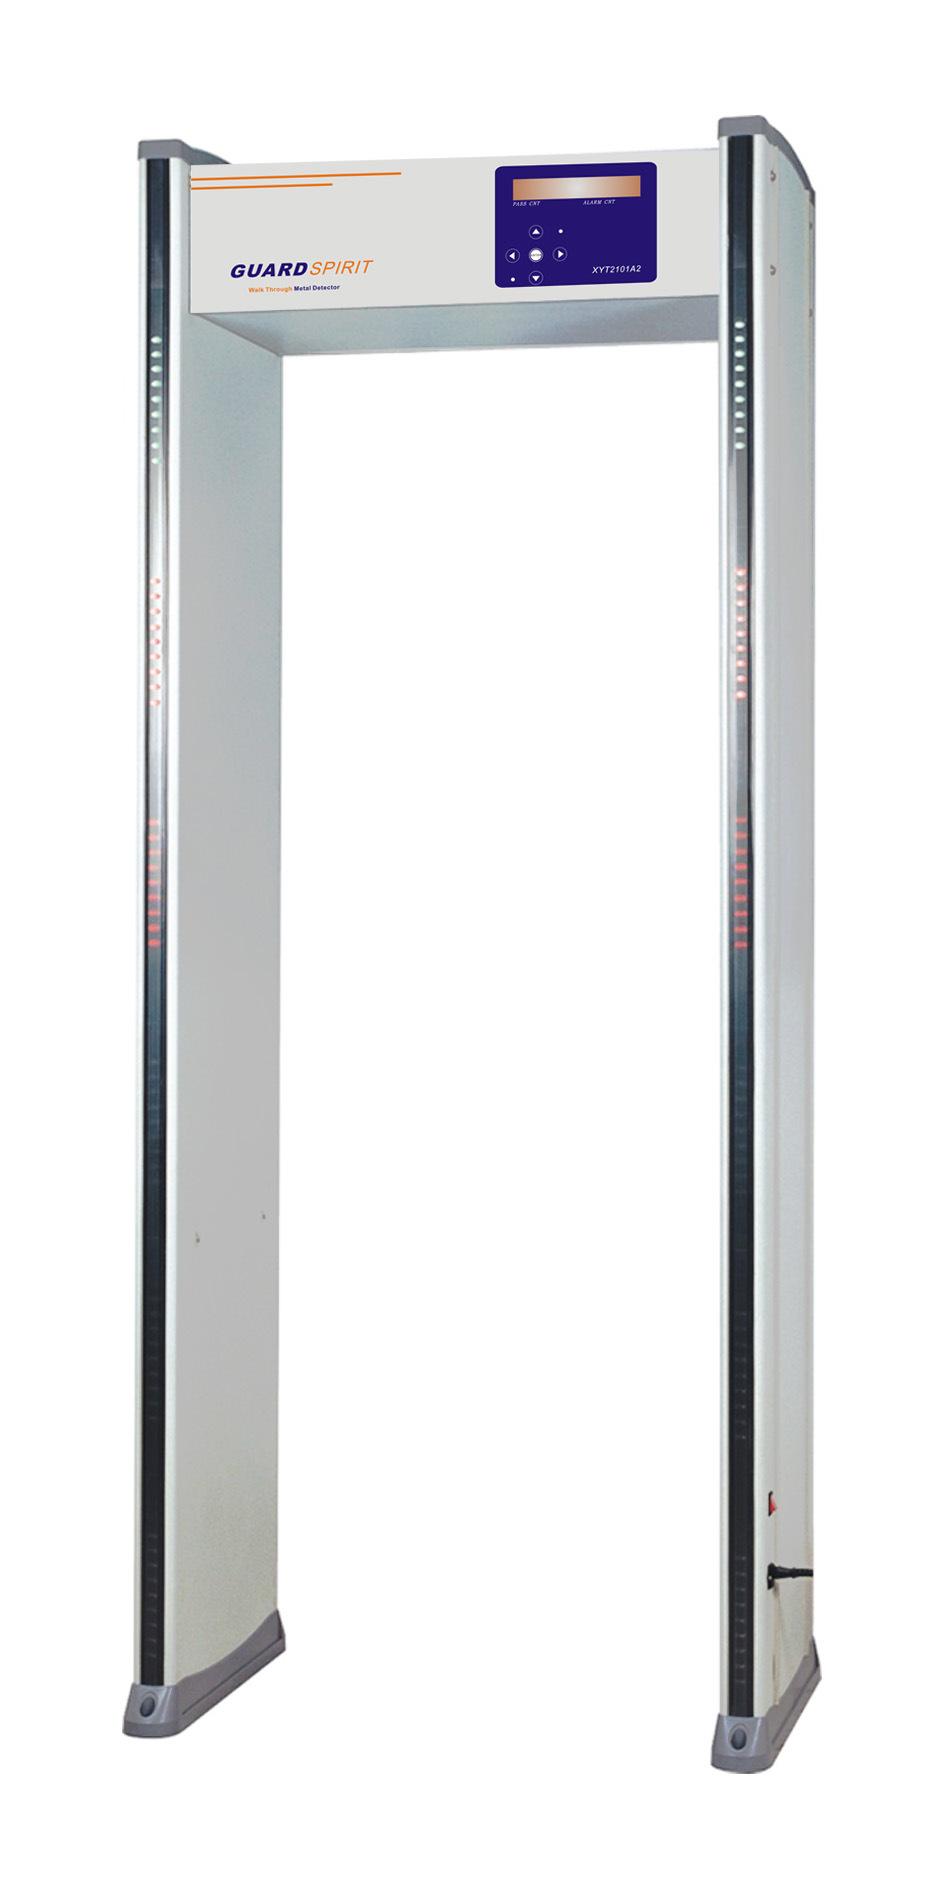 Popular Products 6 Zones Walk-Through Metal Detector Xyt2101A2